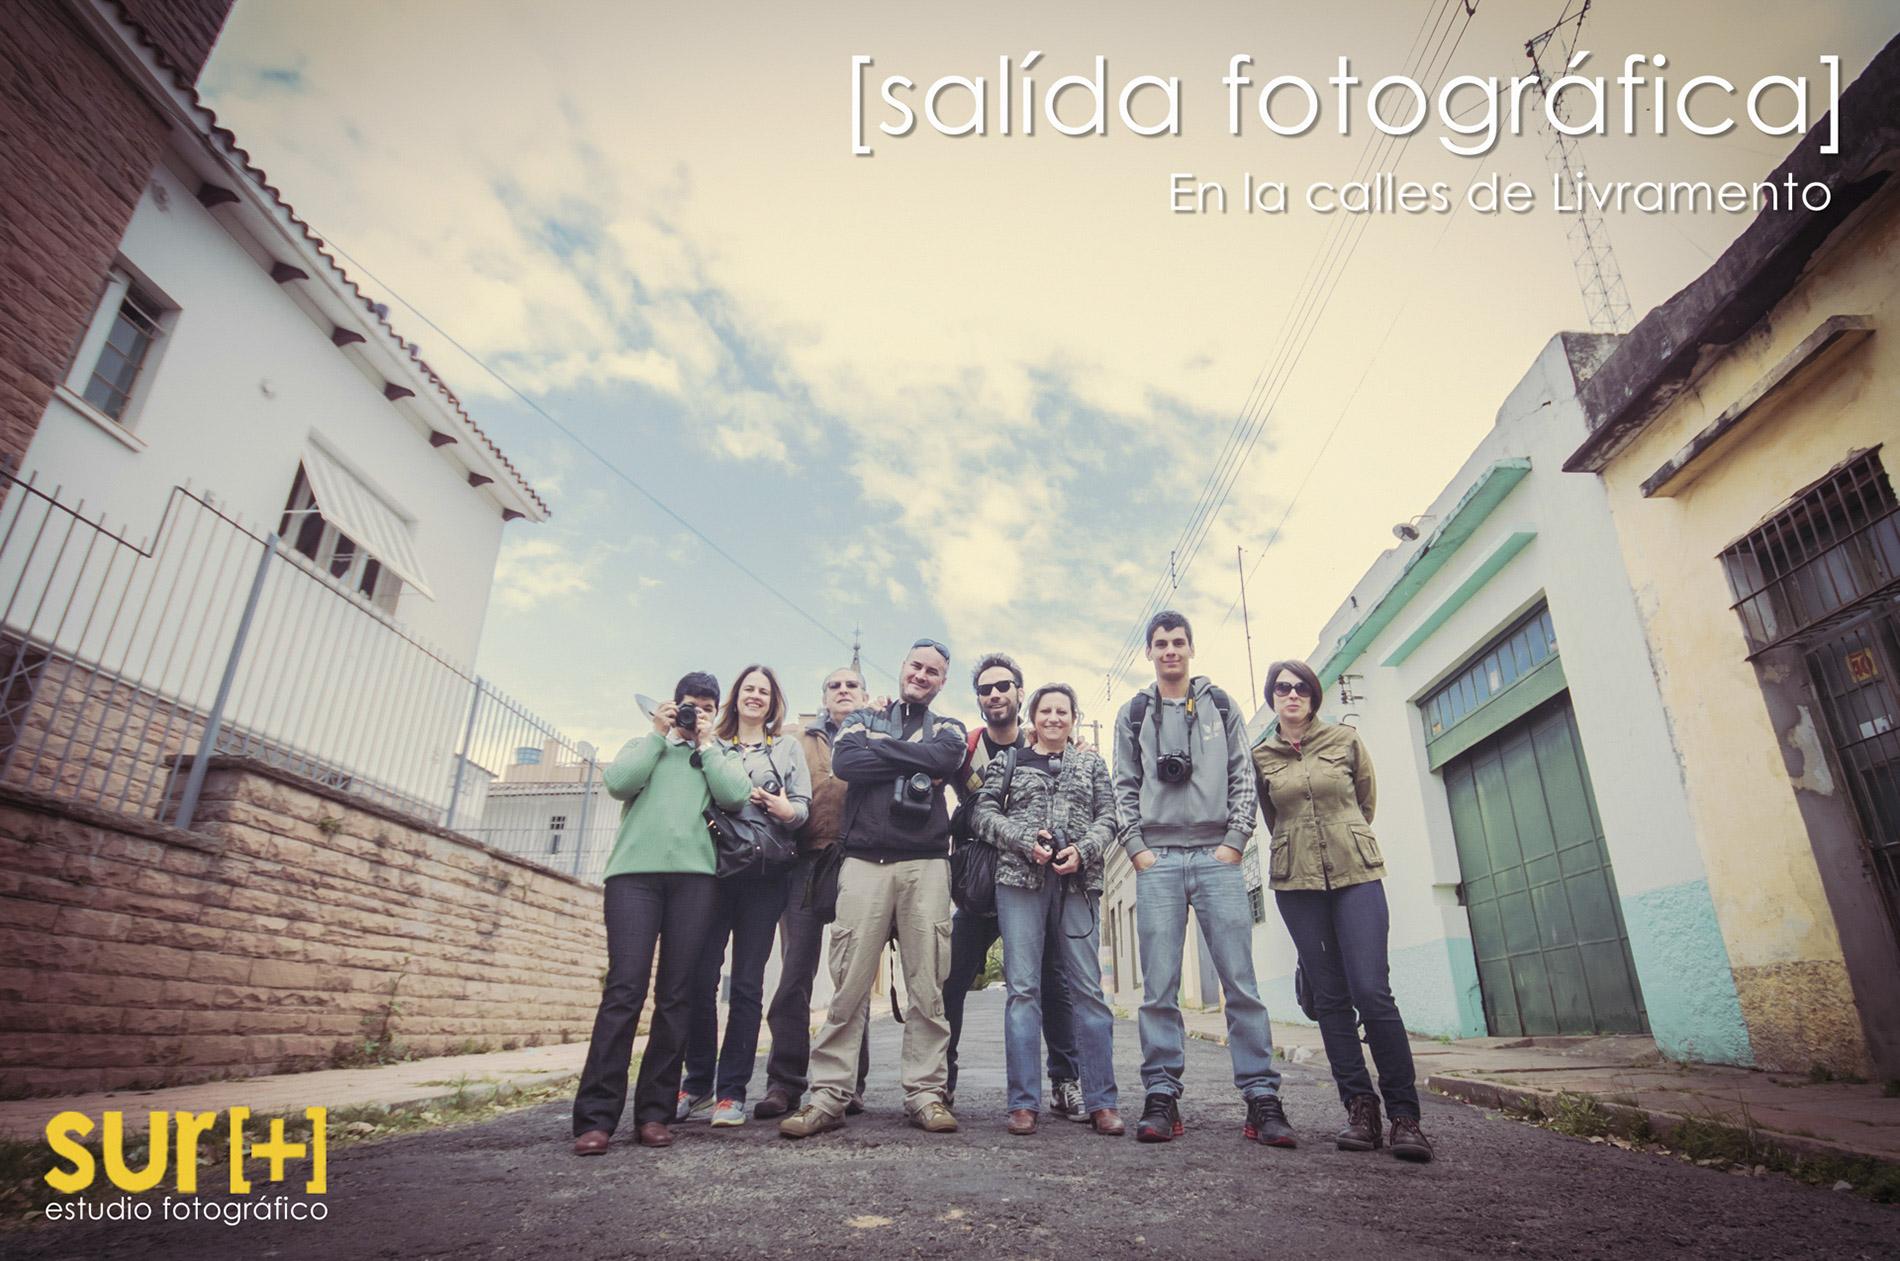 Taller de fotografía en Rivera - Vol. II